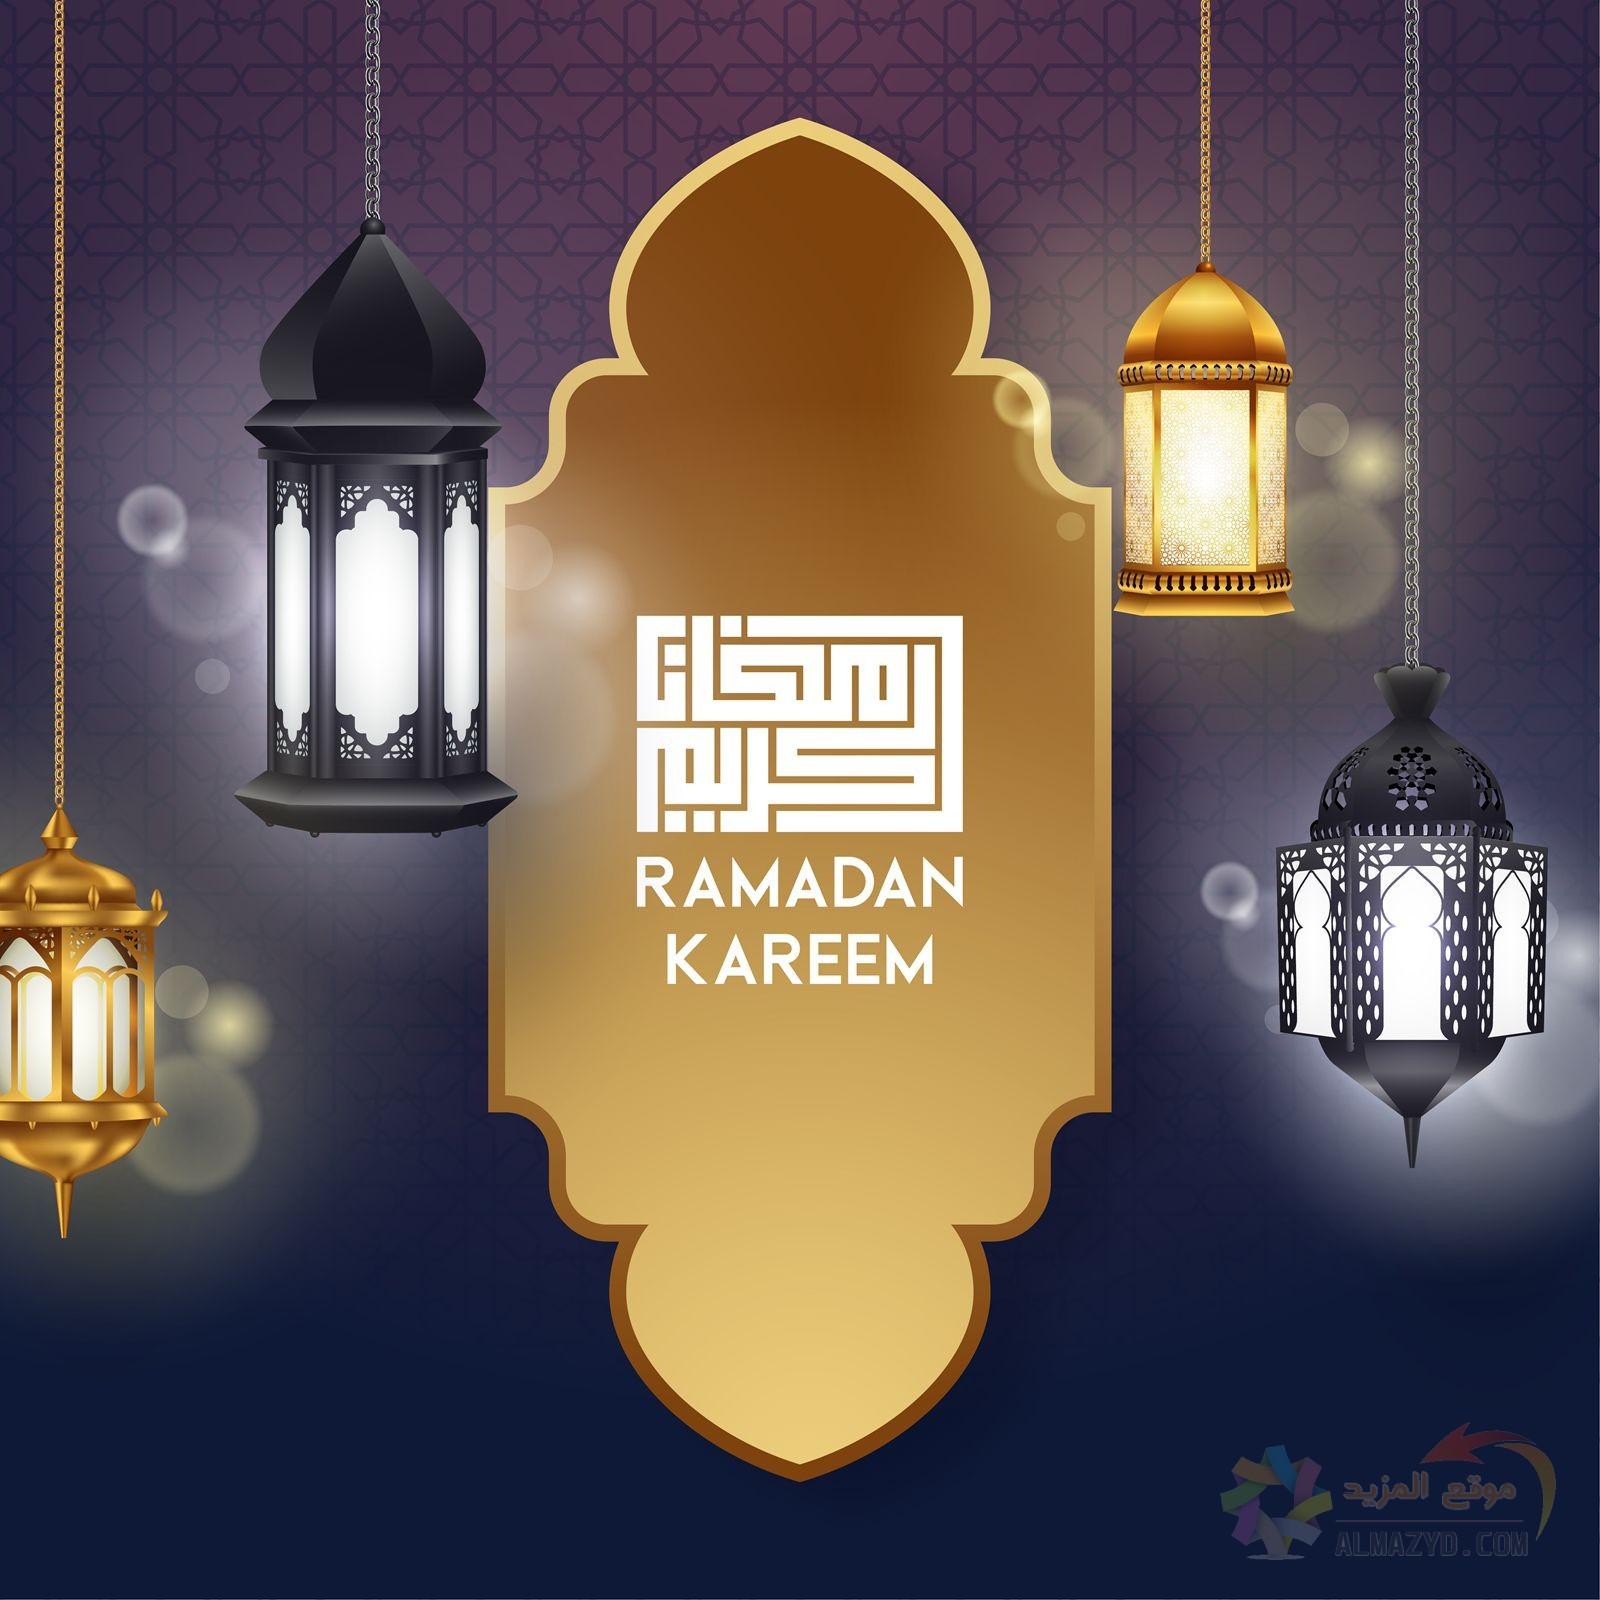 صور رمضان 2020 رمزيات و خلفيات رمضان كريم سوبر كايرو